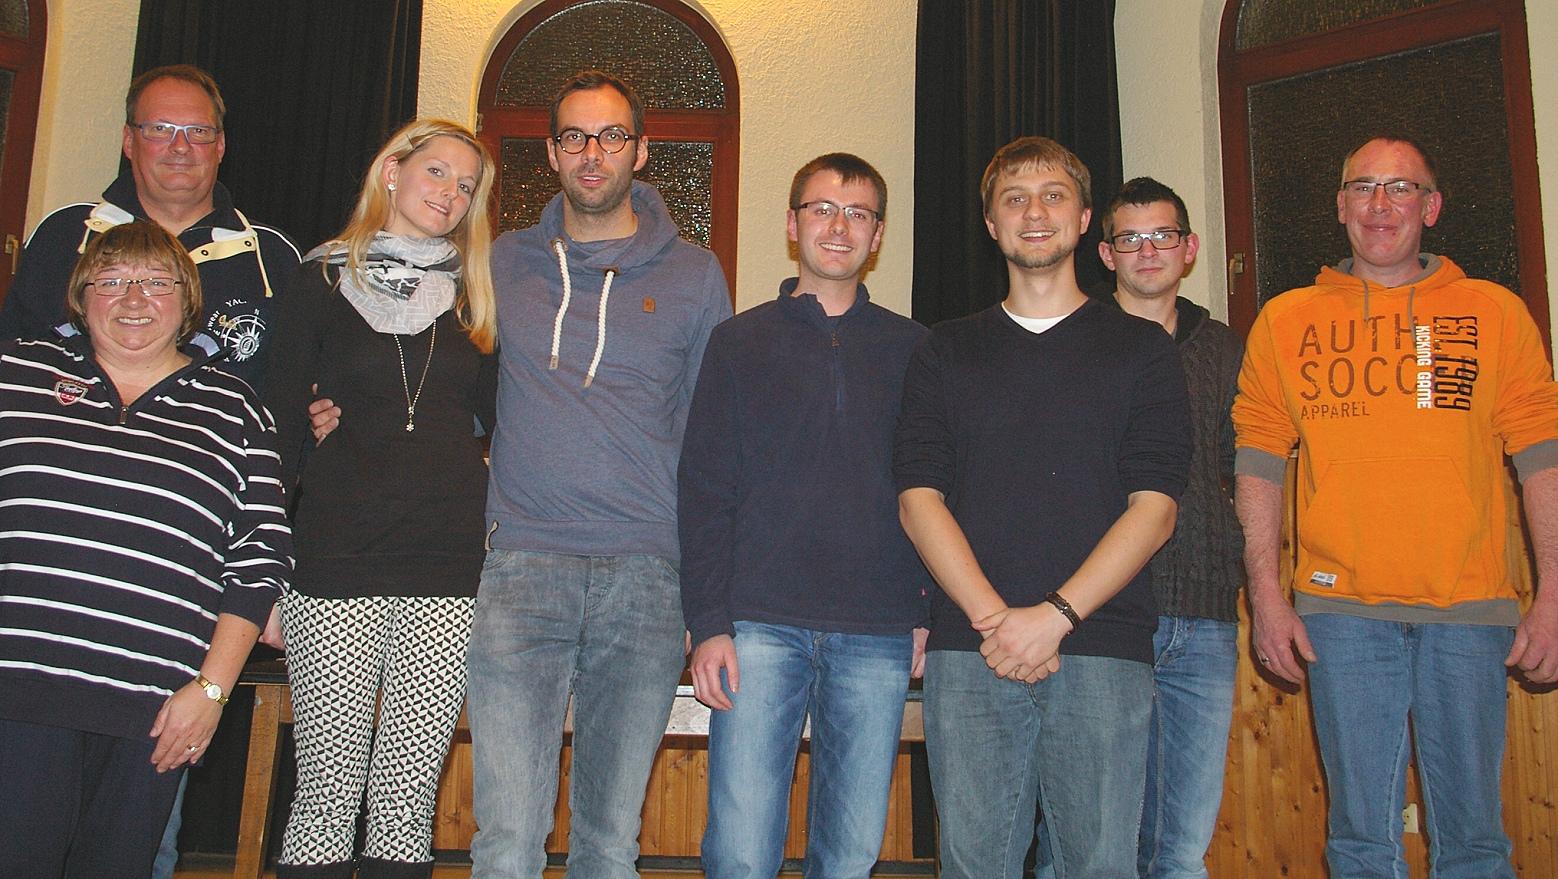 Die Coburger Nikoausfahrer (v. li.): Jochen und Inge Autsch, Franziska Arnold, Sebastian Sonnauer, Stefan Rüger, David Kessel, Bernd Grell und Markus Furkert